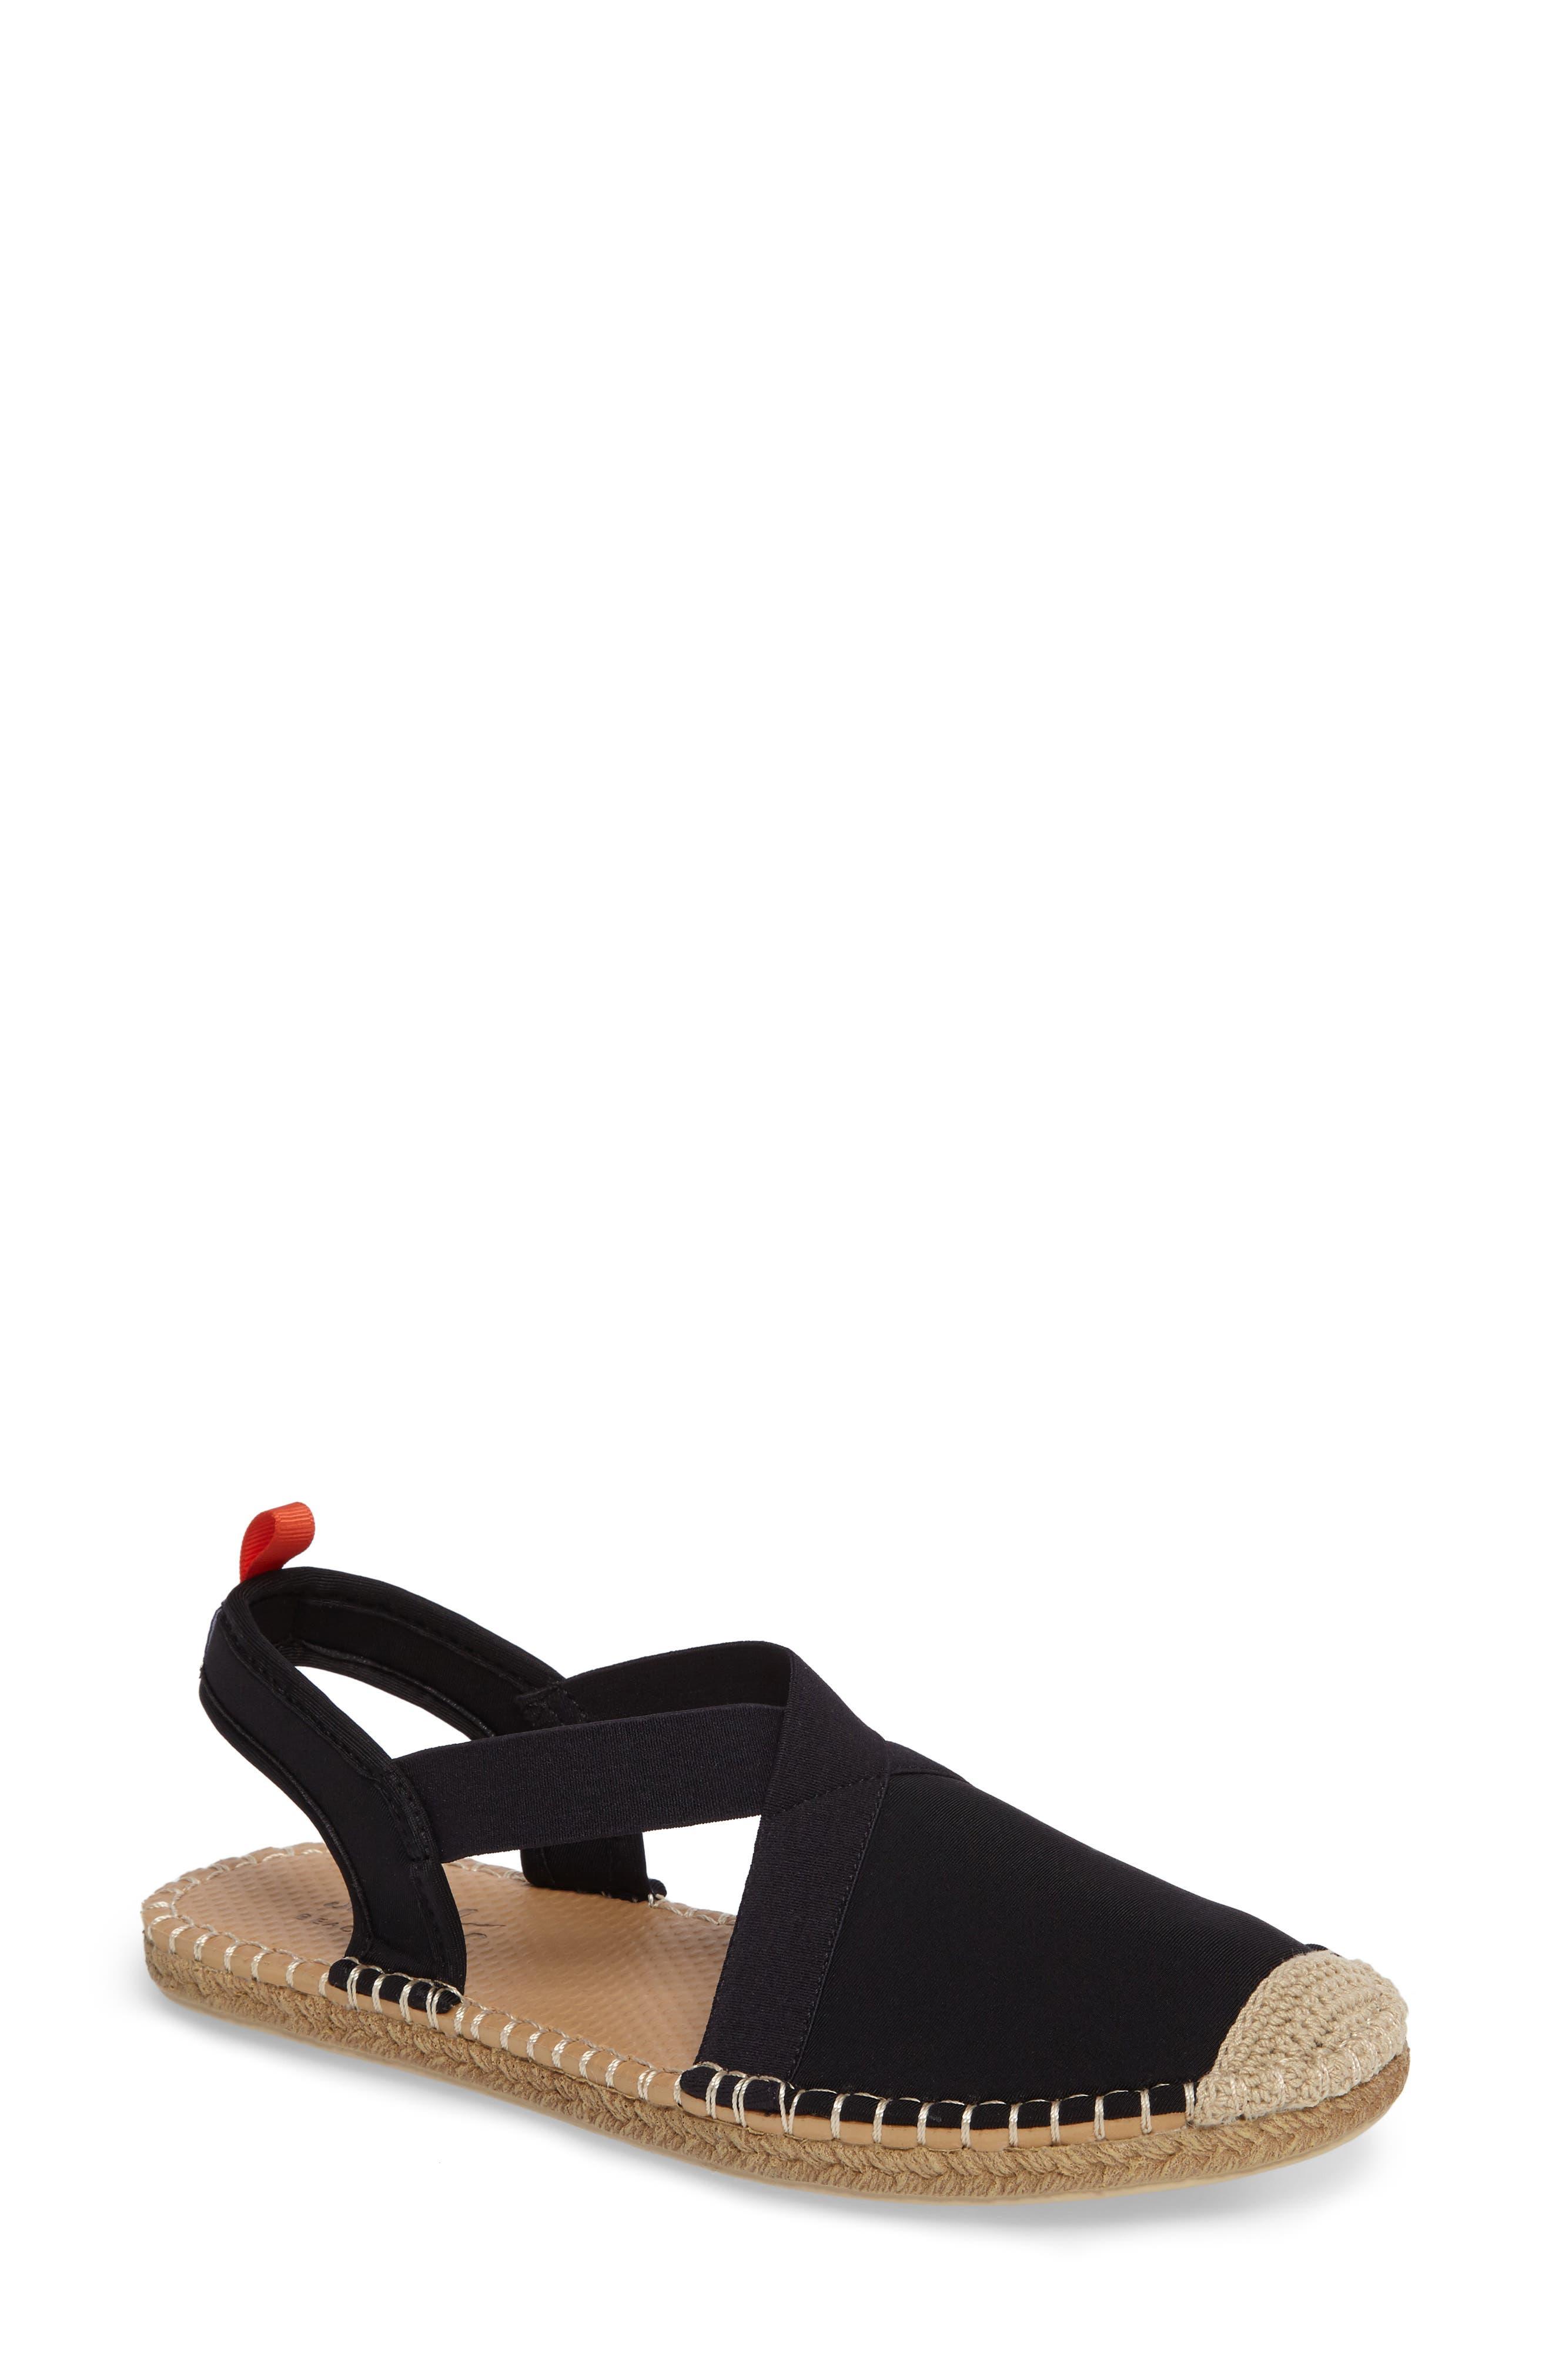 Main Image - Sea Star Slingback Espadrille Water Shoe (Women)